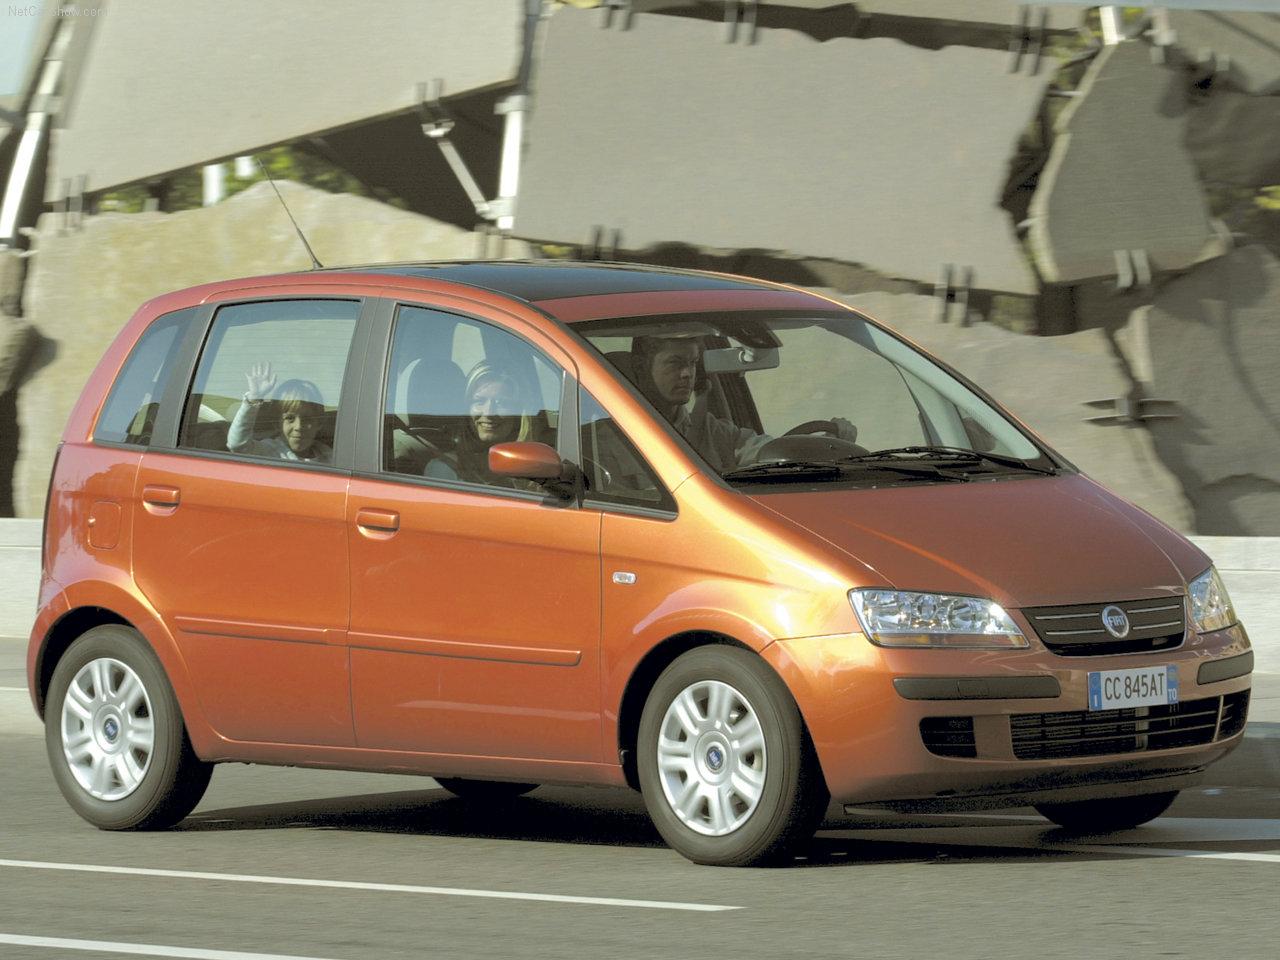 Mardi 8 mars 2011 for Fiat idea 1 6 16v ficha tecnica